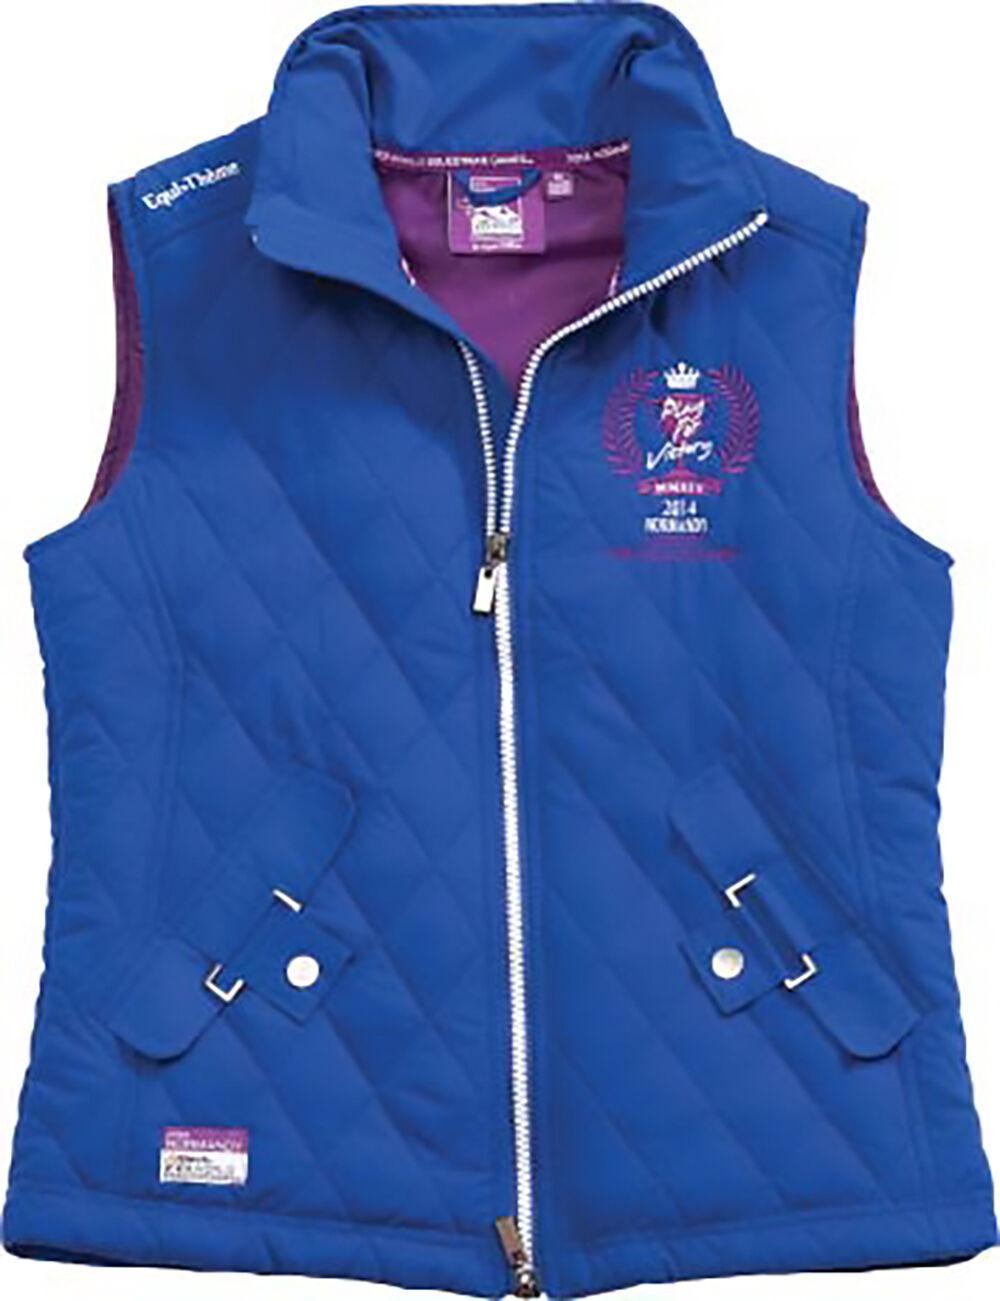 Equi theme Ladies Equestrian Waistcoat FREE P&P